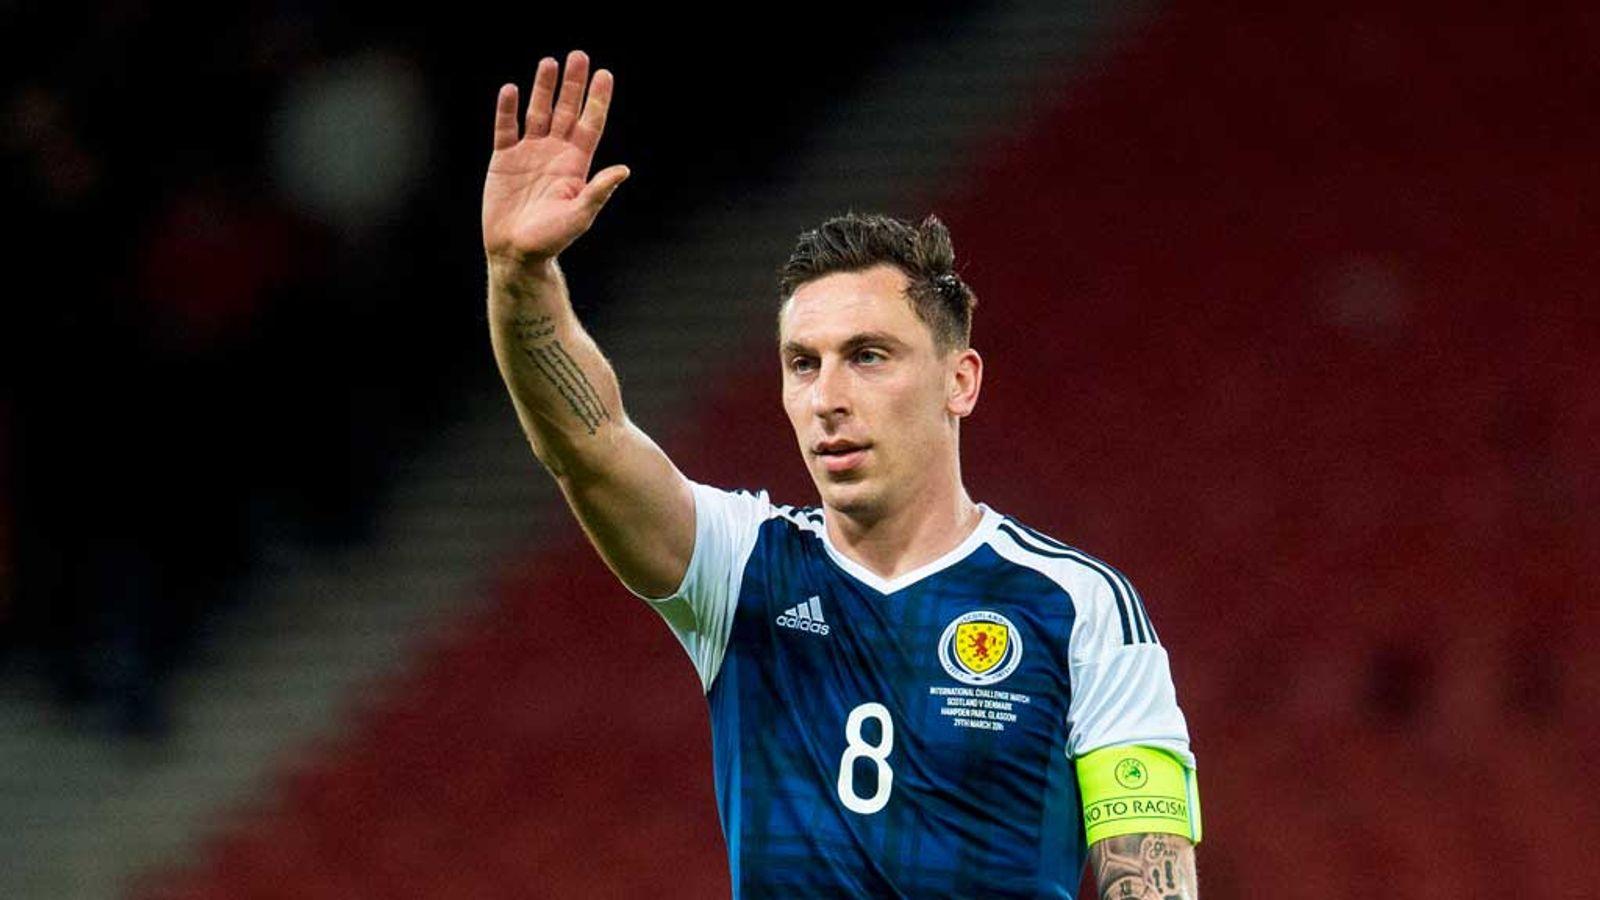 Celtic midfielder Scott Brown retires from Scotland duty